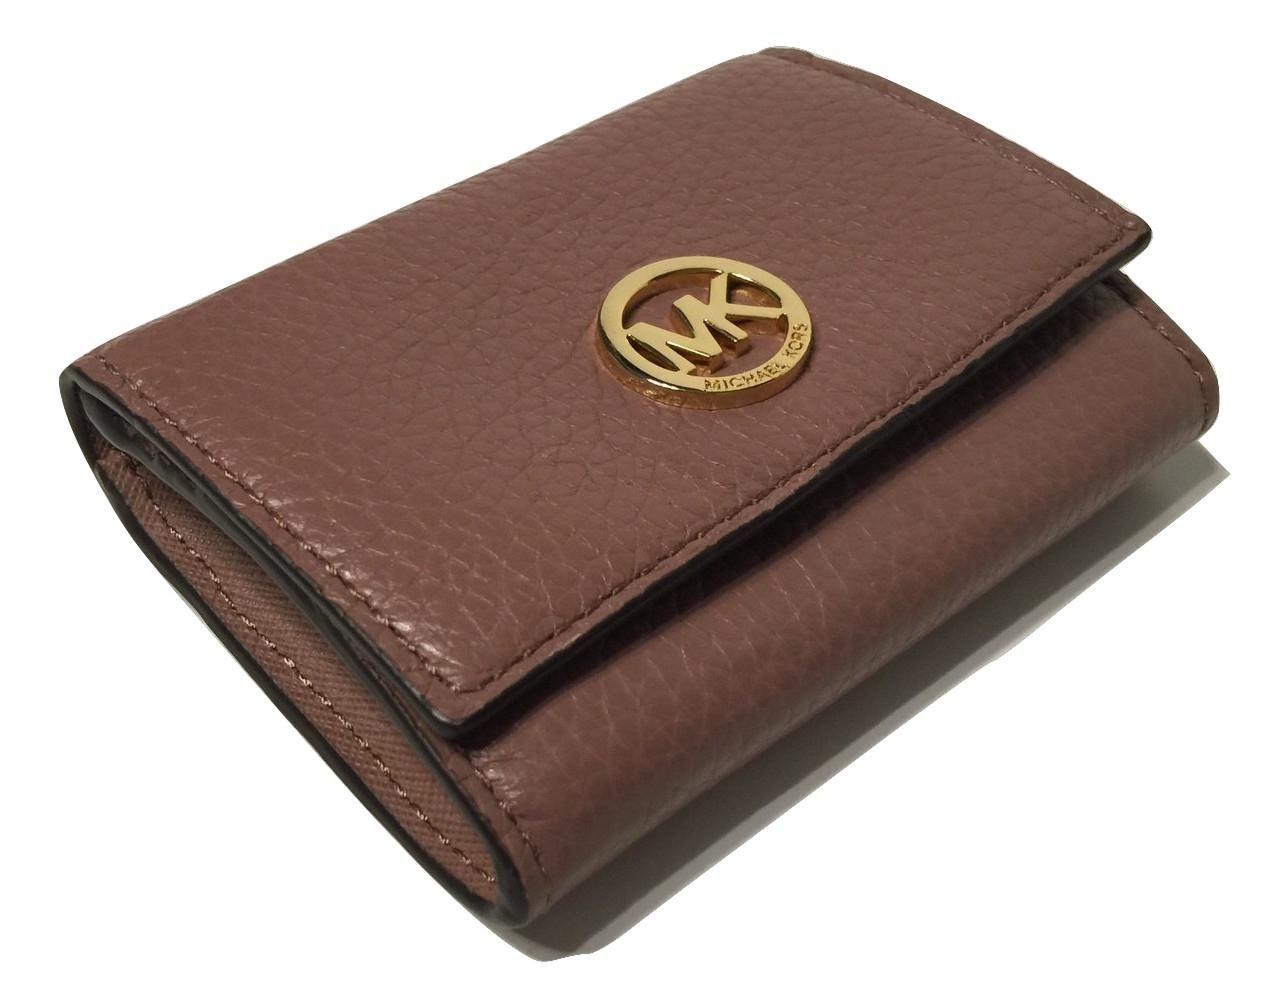 894d6223936b Michael Kors Fulton Snap Credit Card Case Holder. Free shipping and  guaranteed…